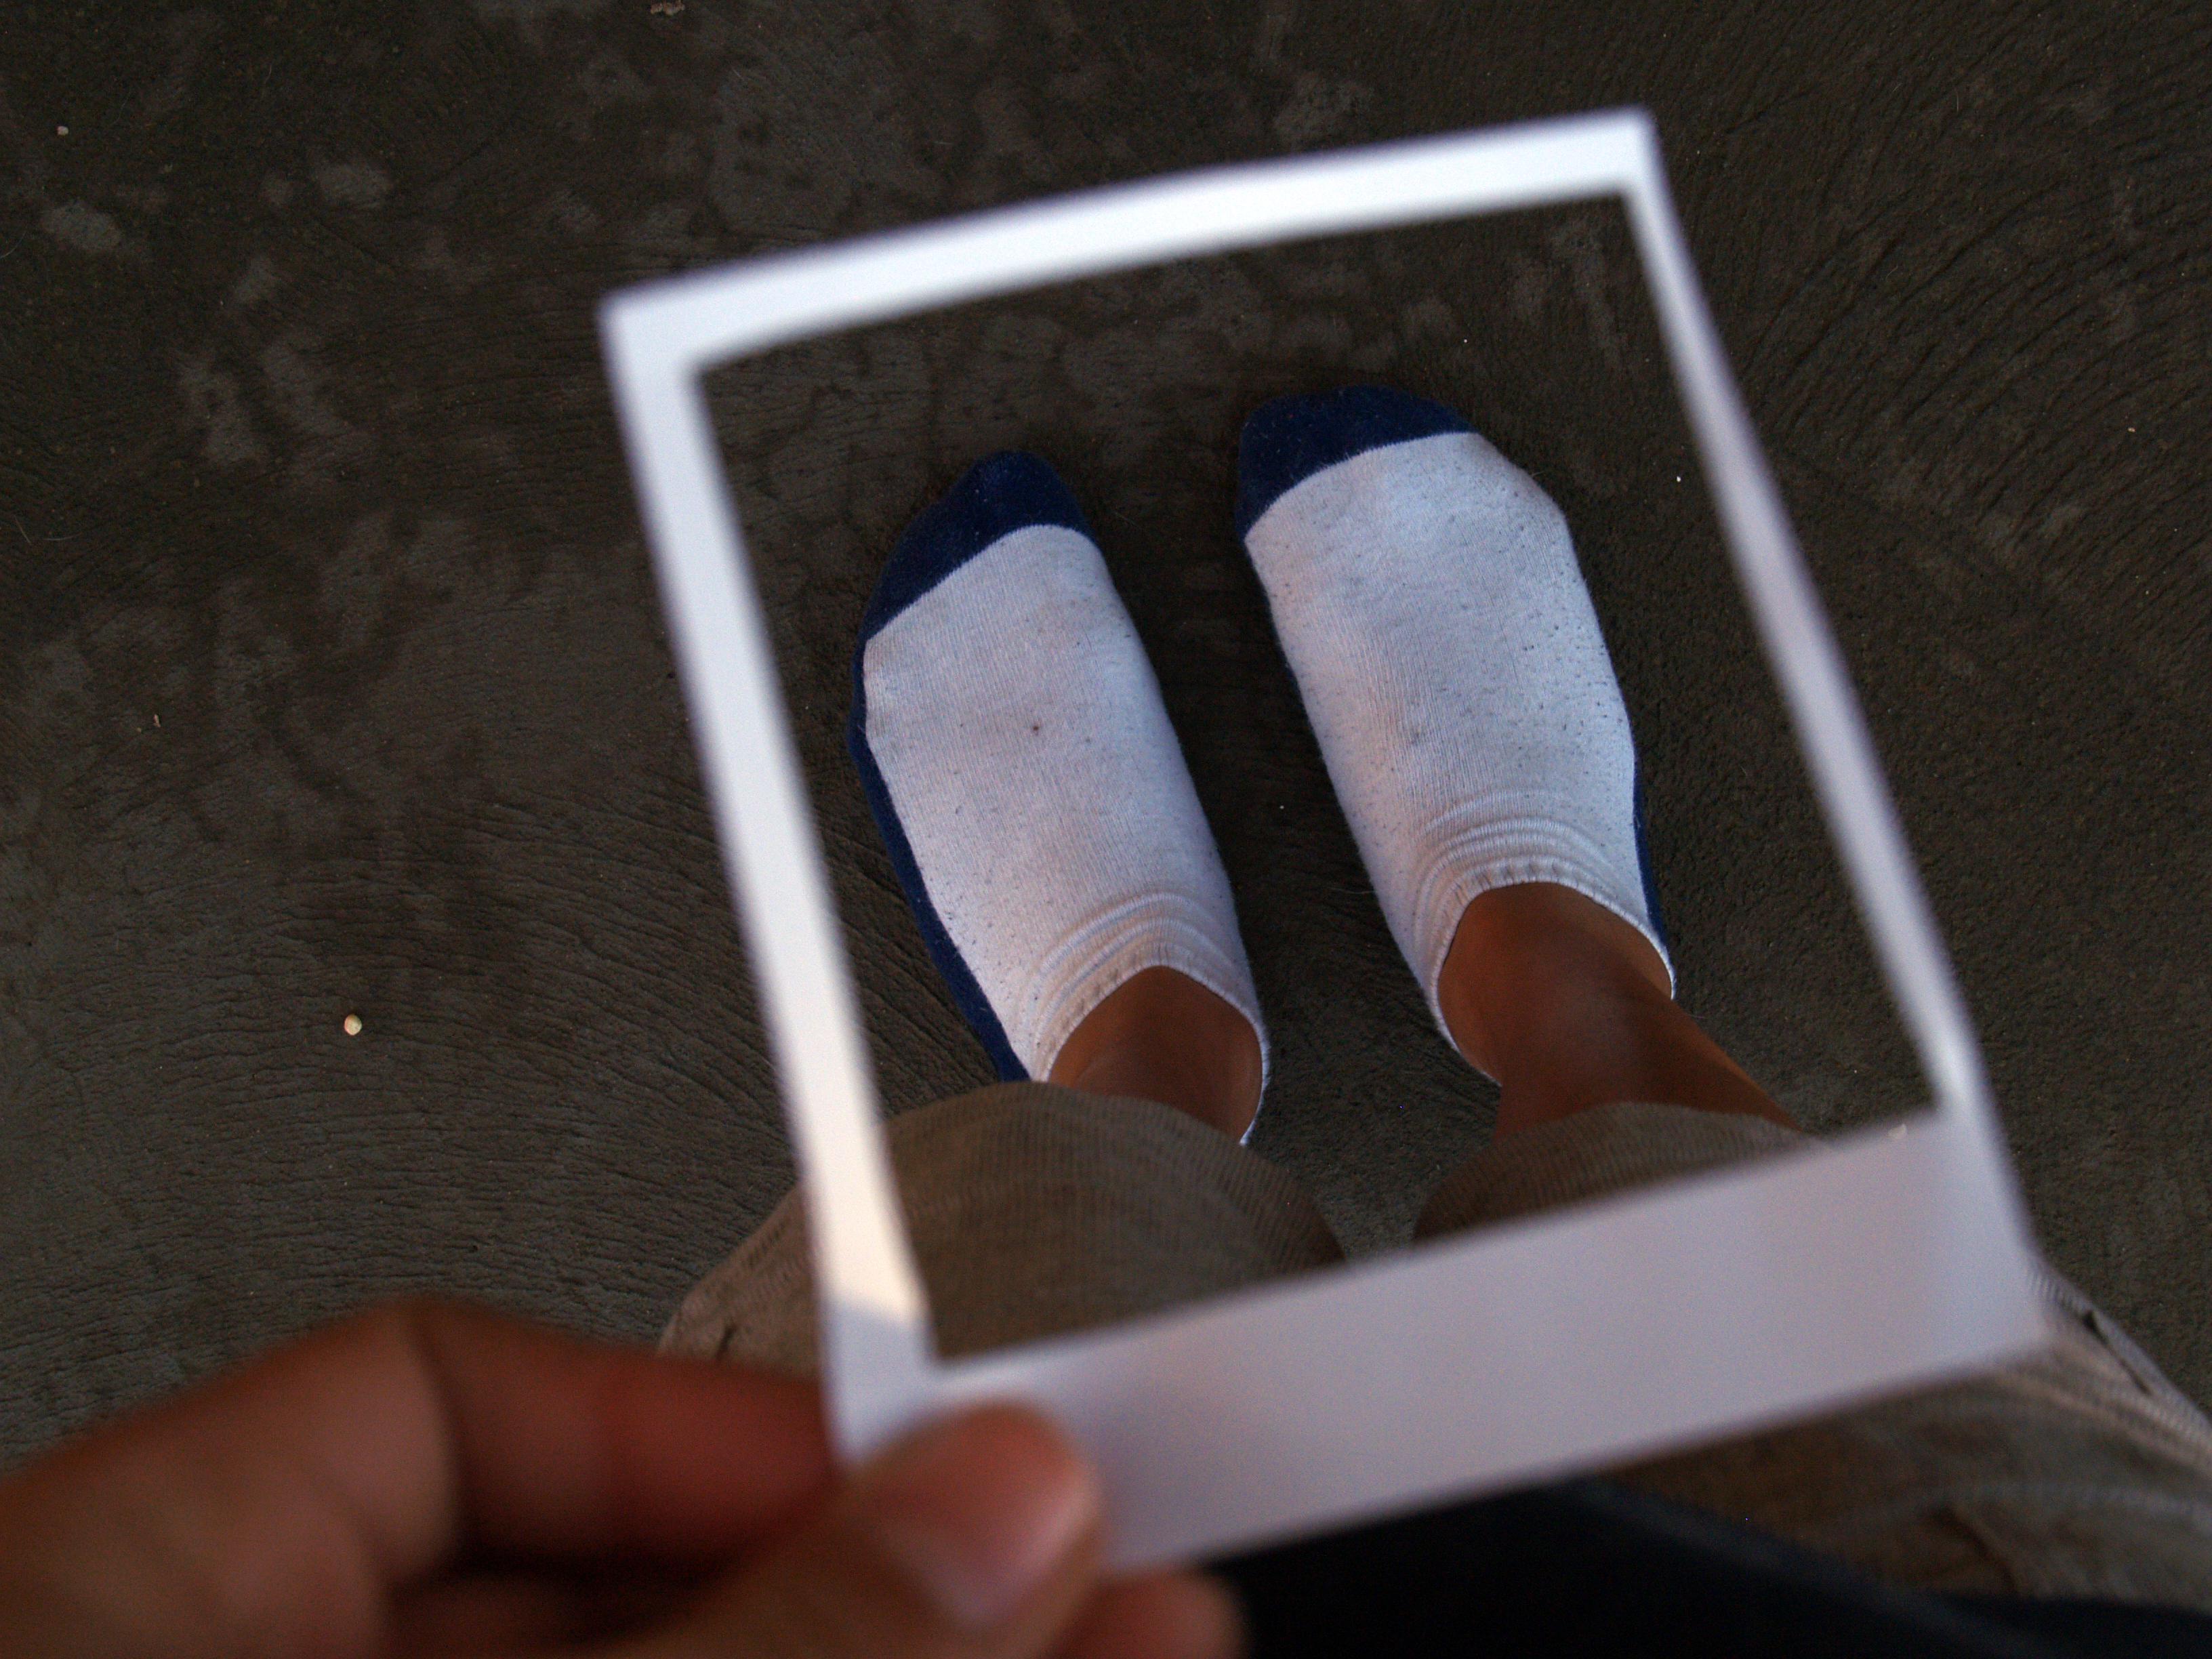 Hintergrundbilder : Weiß, kurze Hose, Socken, blau, Rahmen ...